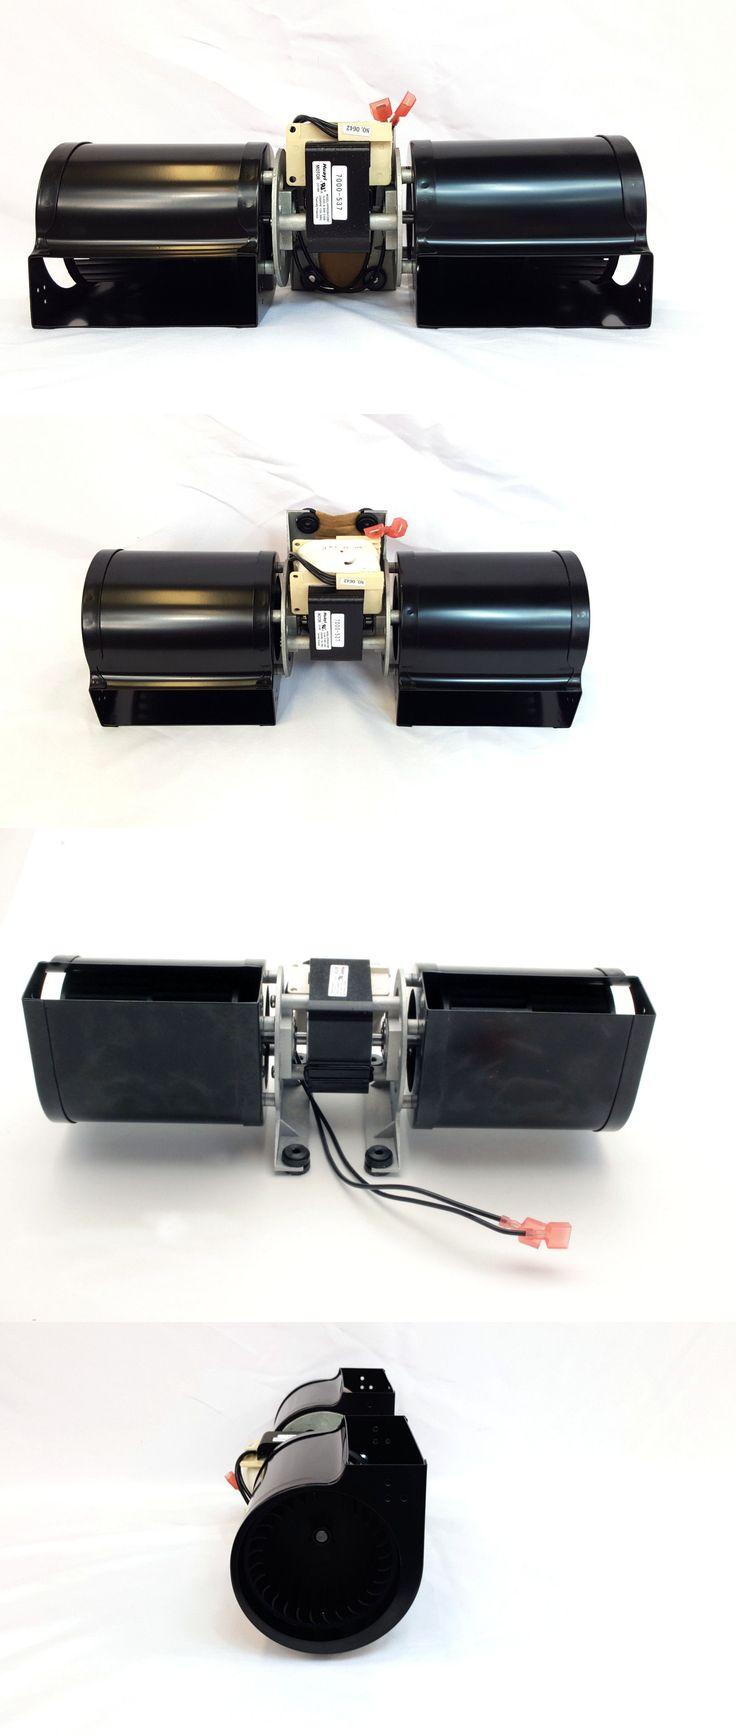 Best 25+ Wood stove blower ideas on Pinterest   Pellets for pellet ...